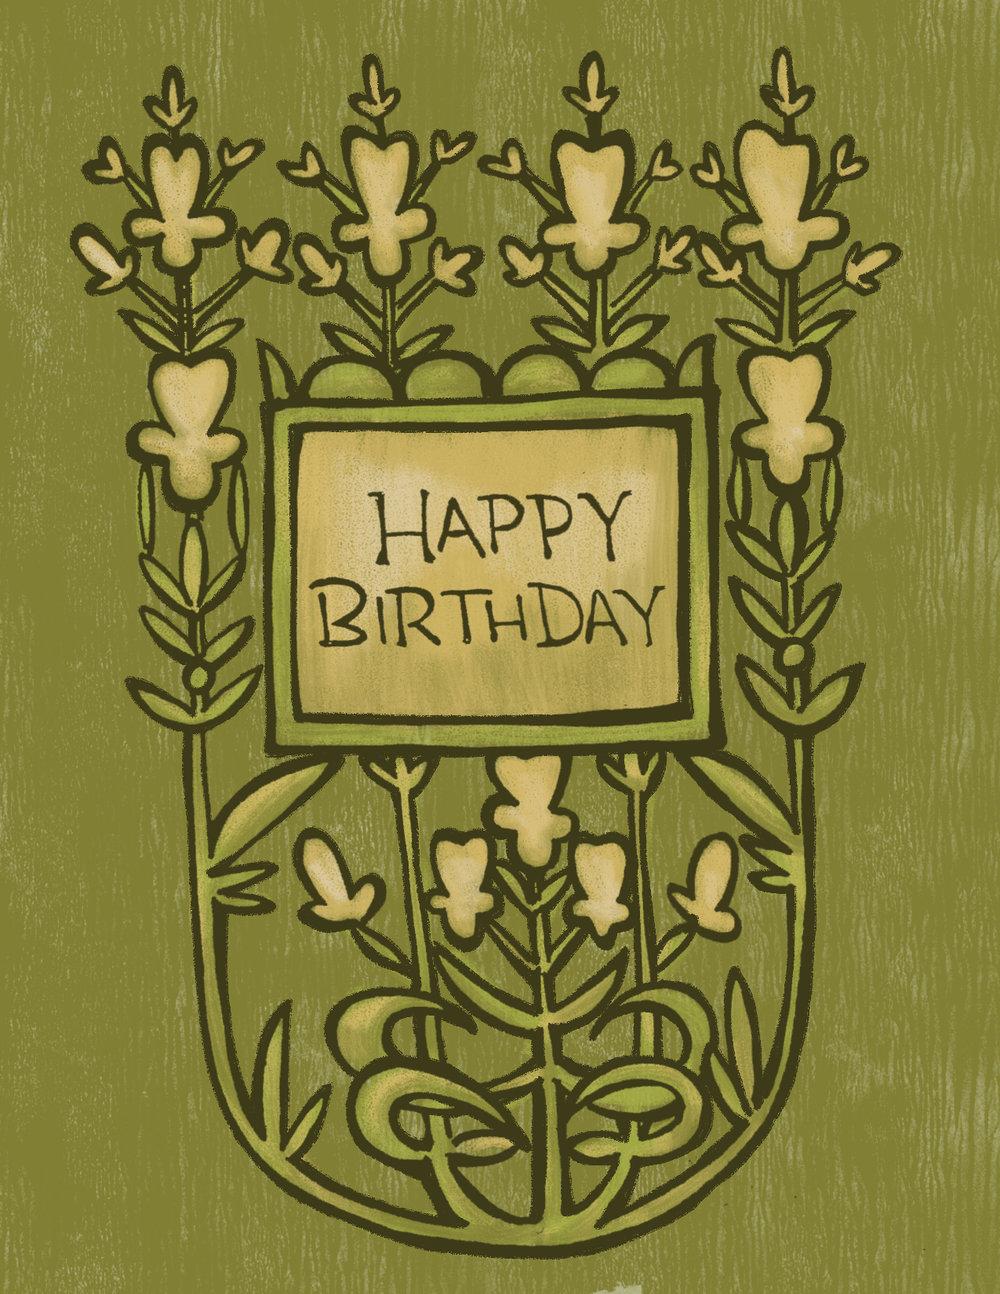 Happy Birthday Green Floral.jpg